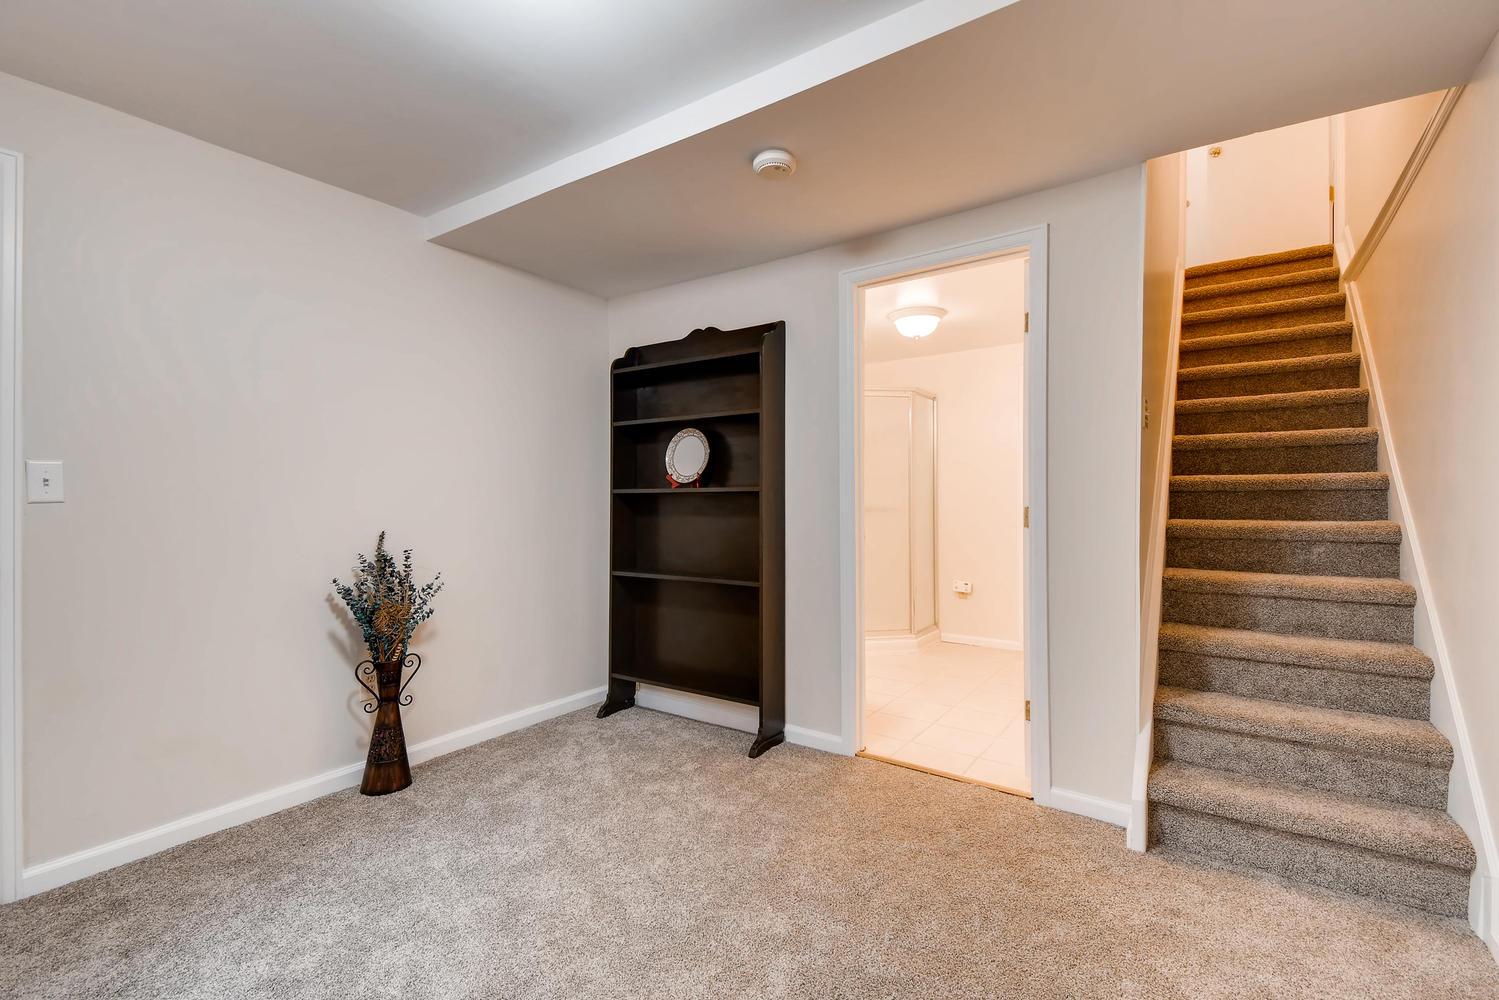 472 Owl Dr Louisville CO 80027-large-021-22-Lower Level Bedroom-1499x1000-72dpi.jpg